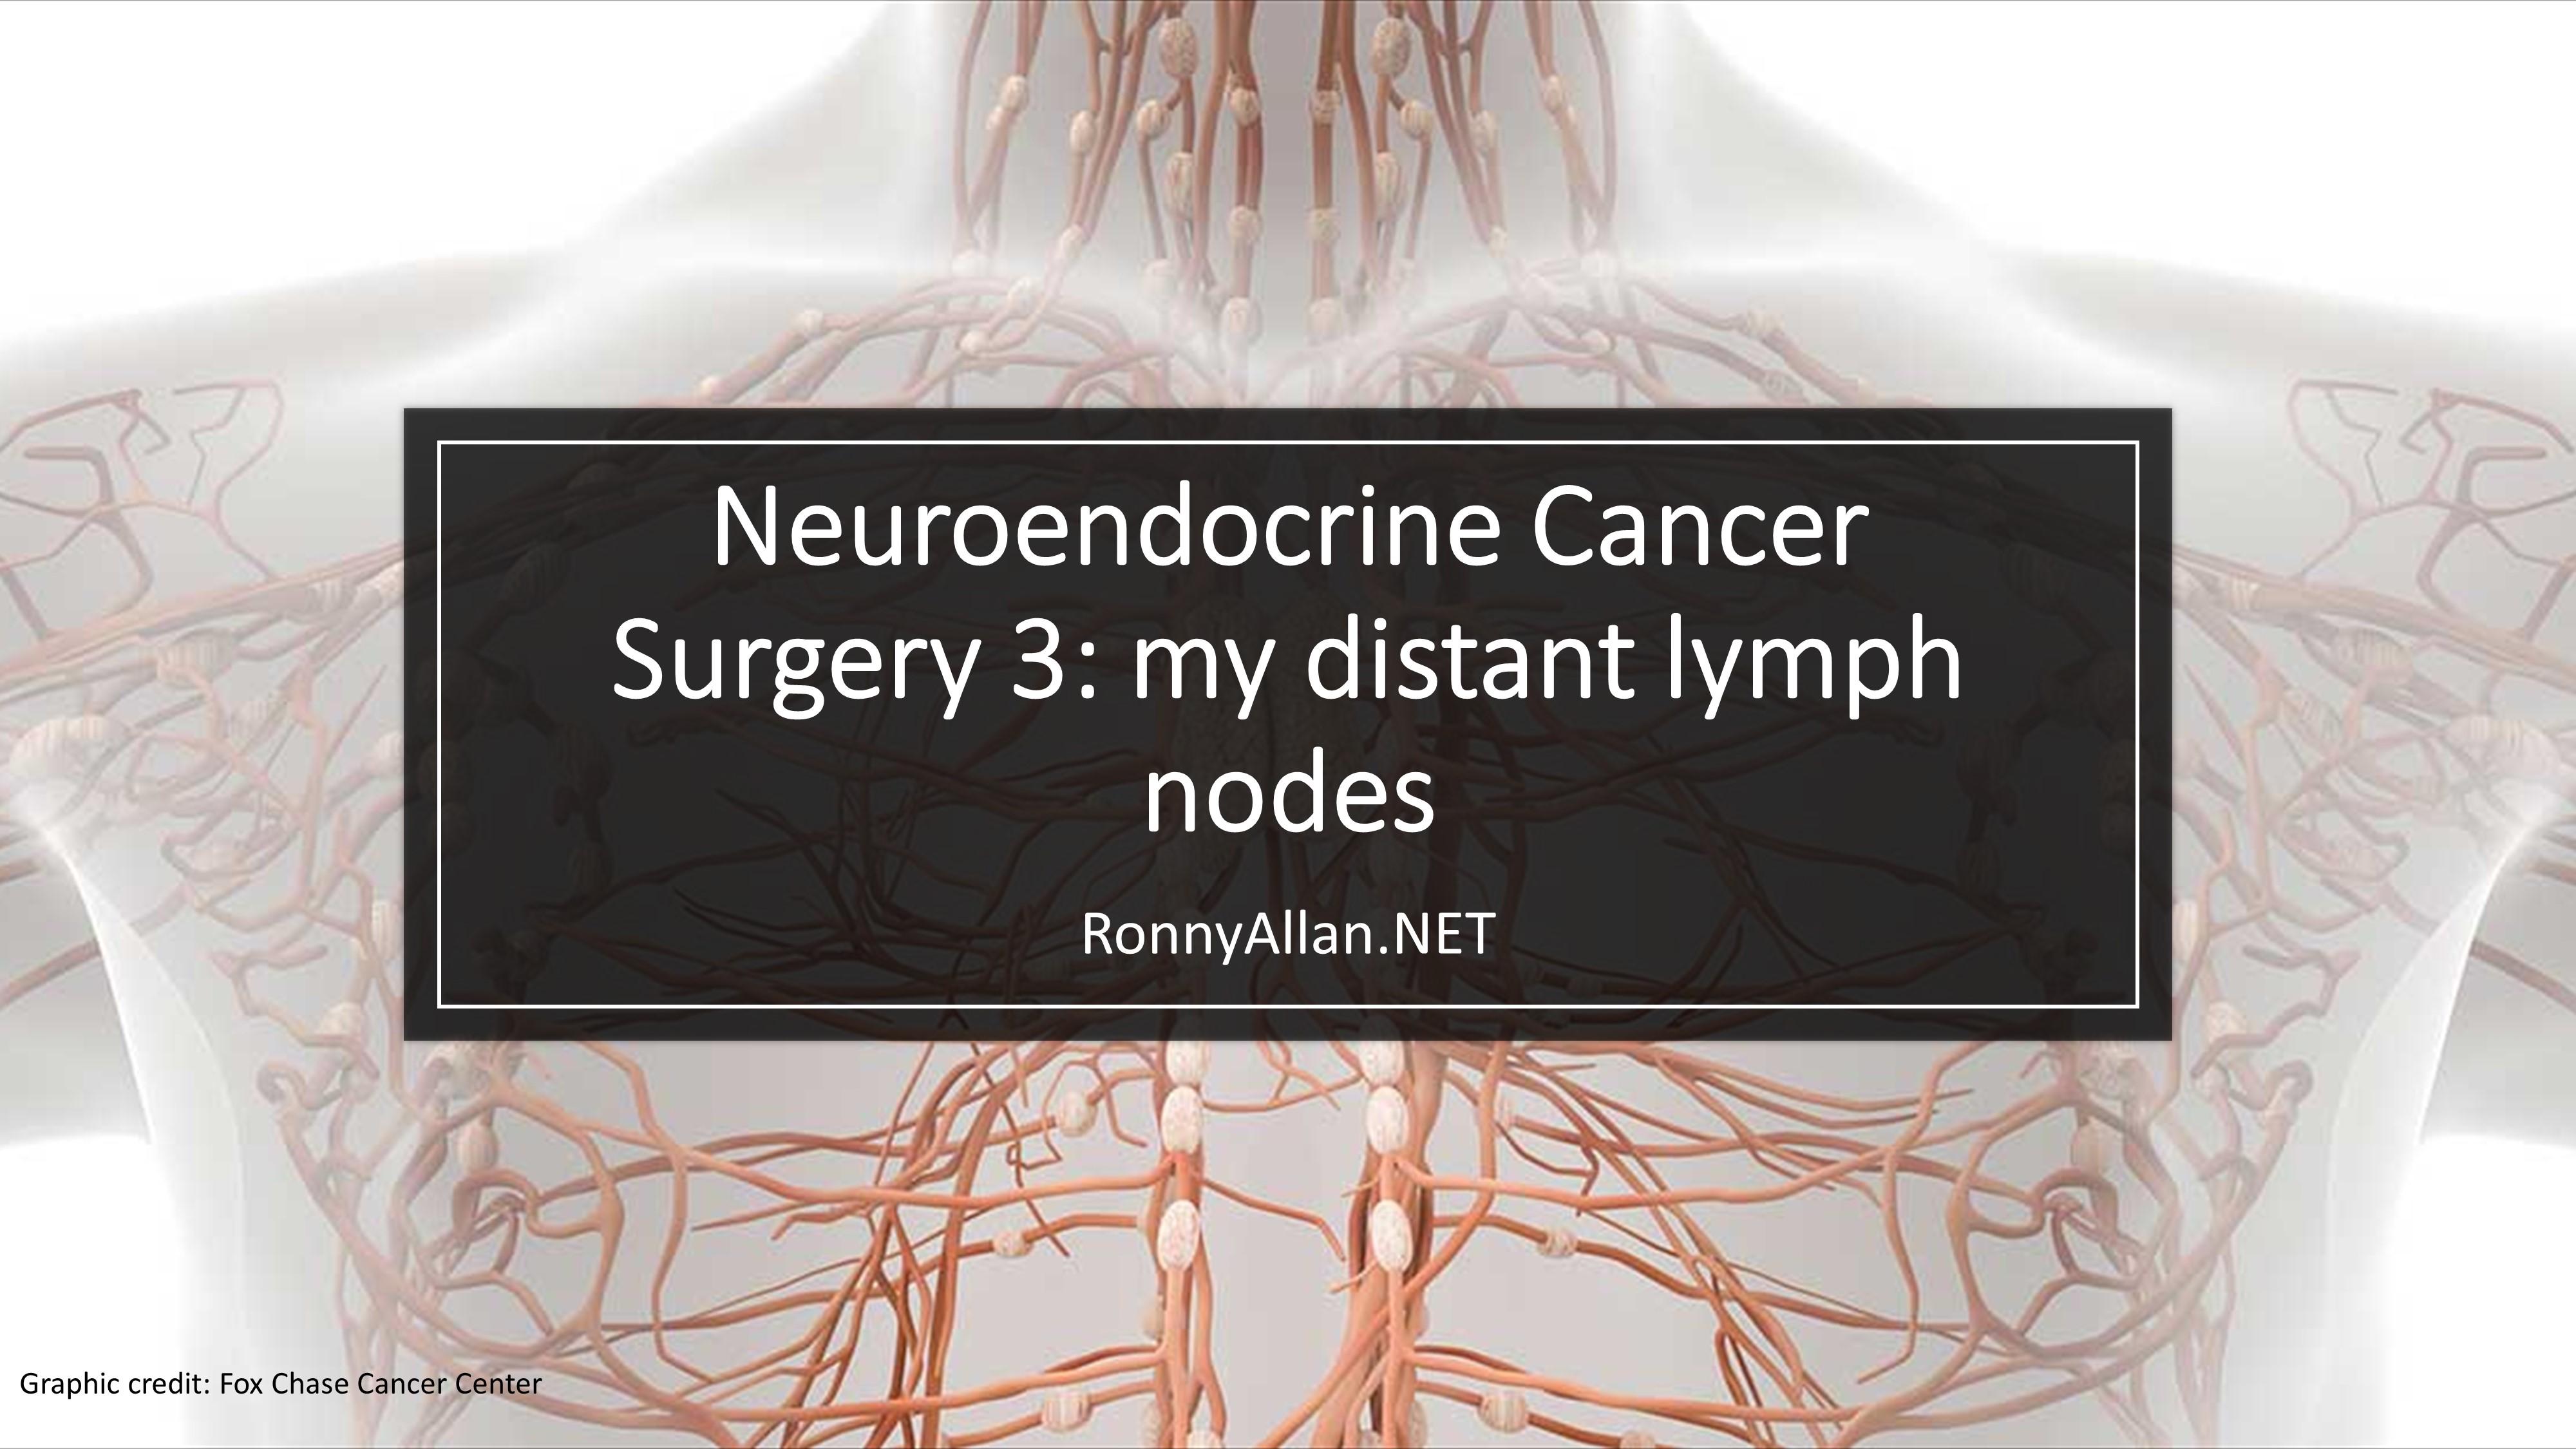 Neuroendocrine Cancer Surgery 3: my distant lymph nodes